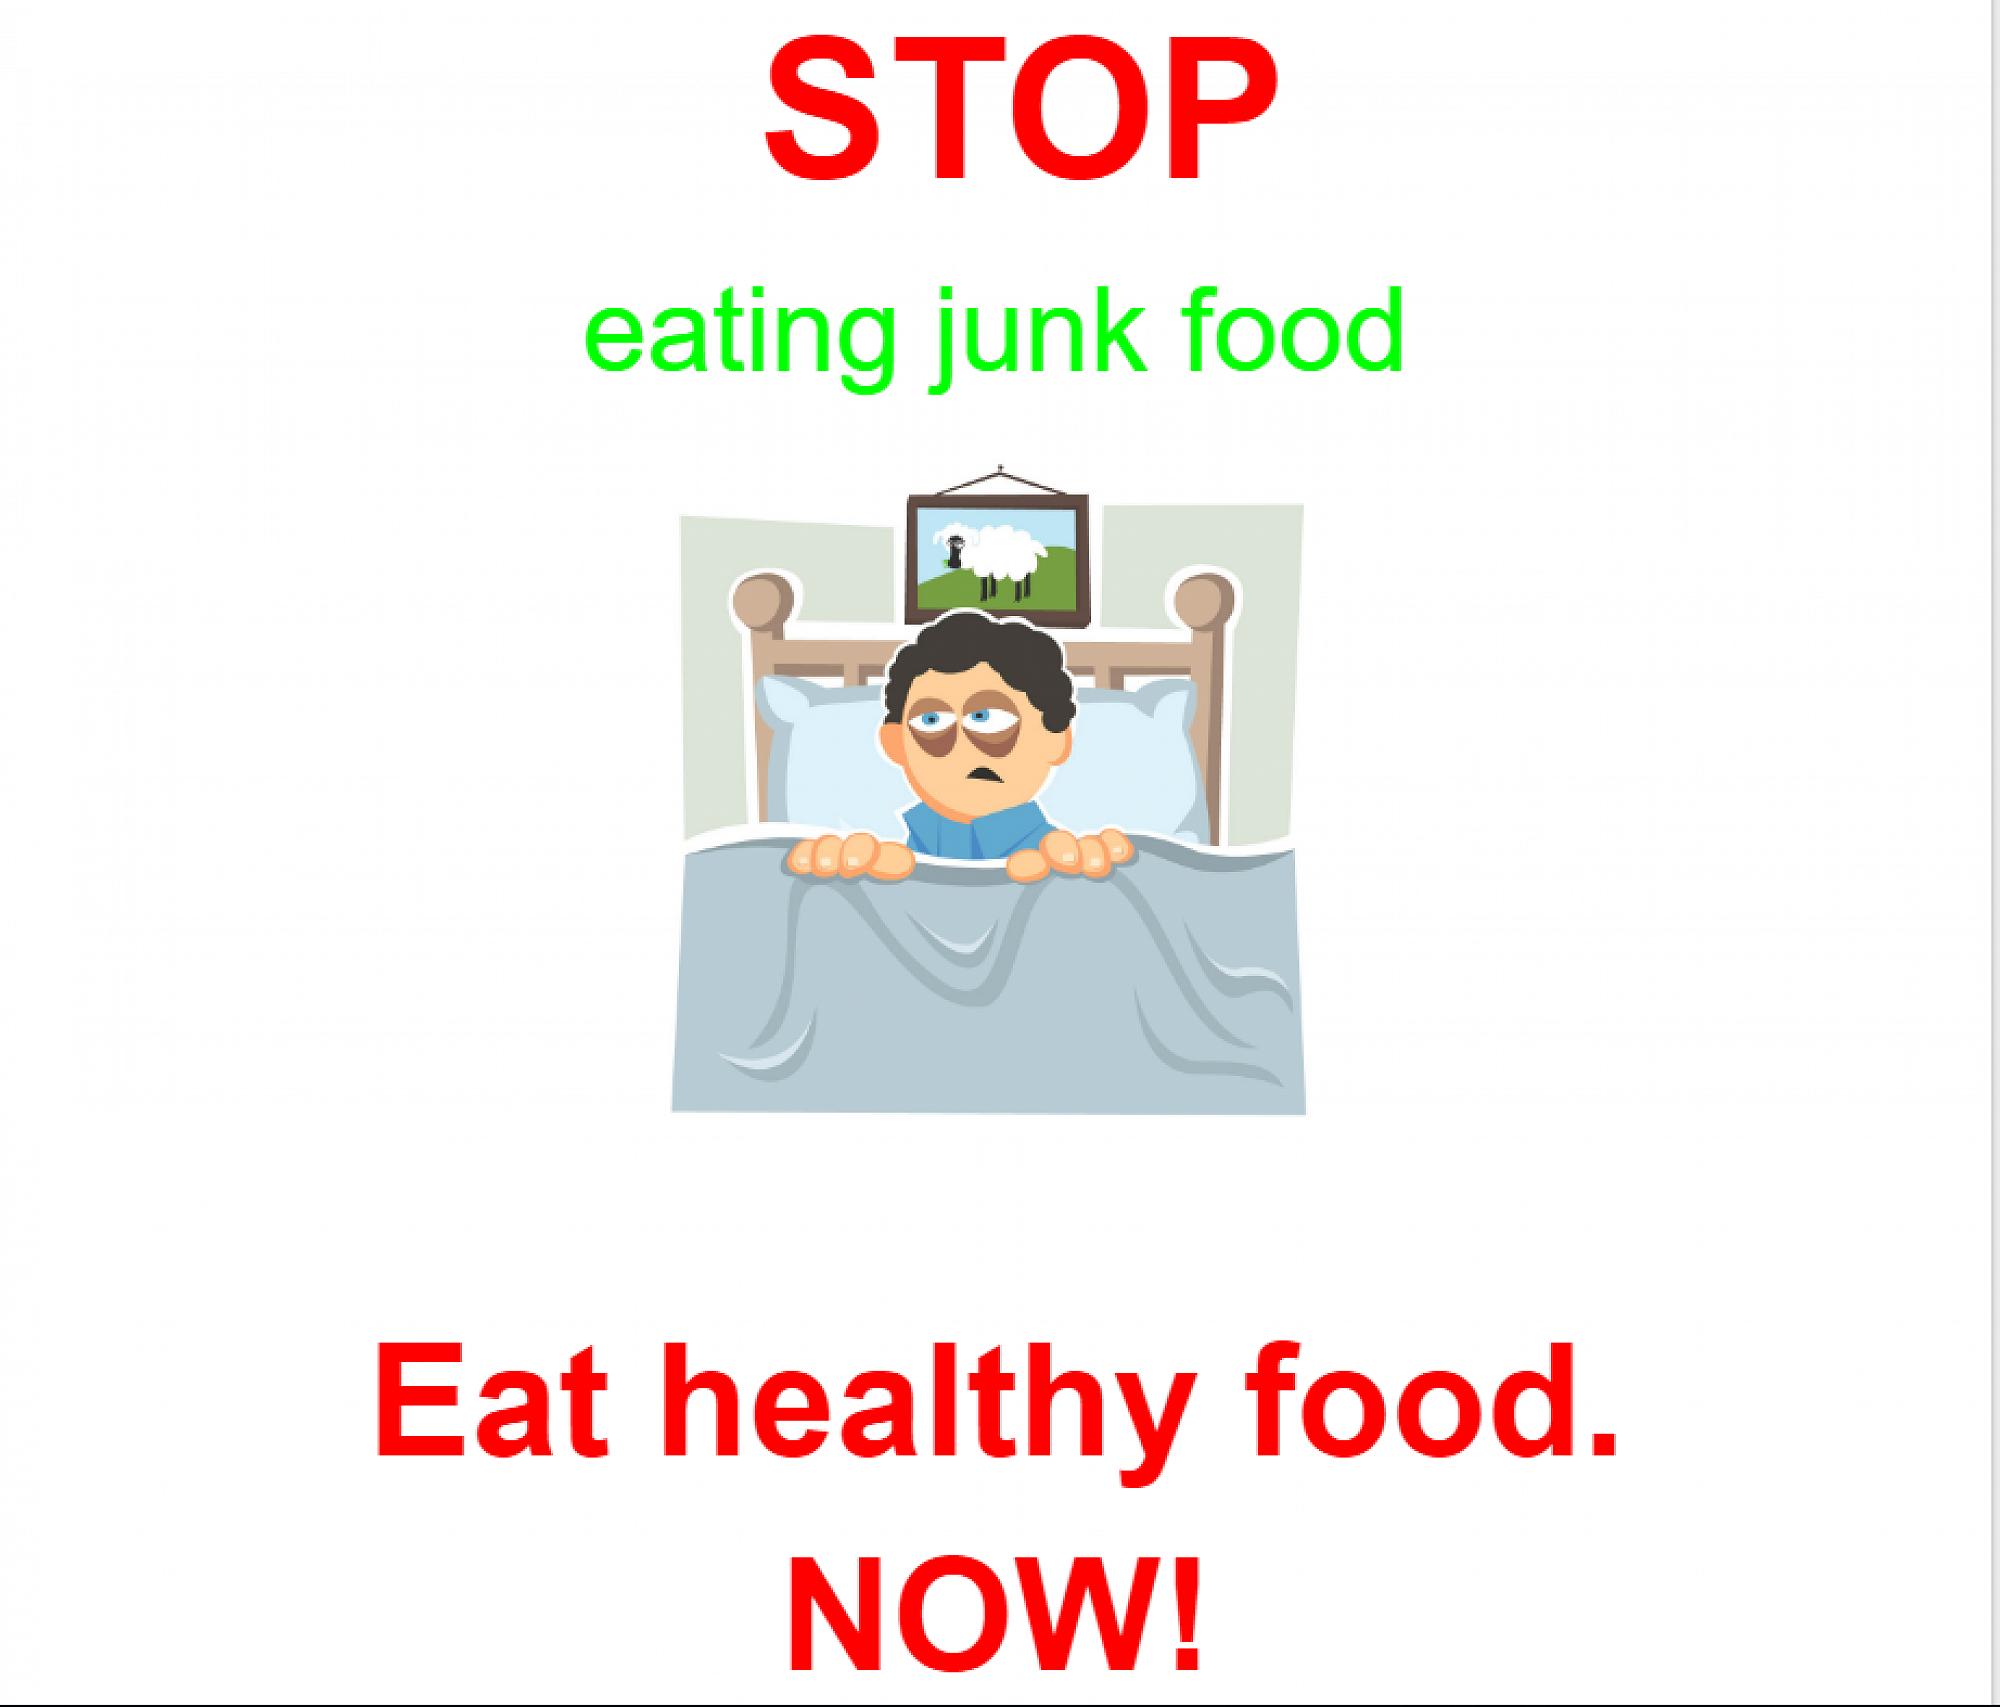 Persuasive Health Posters